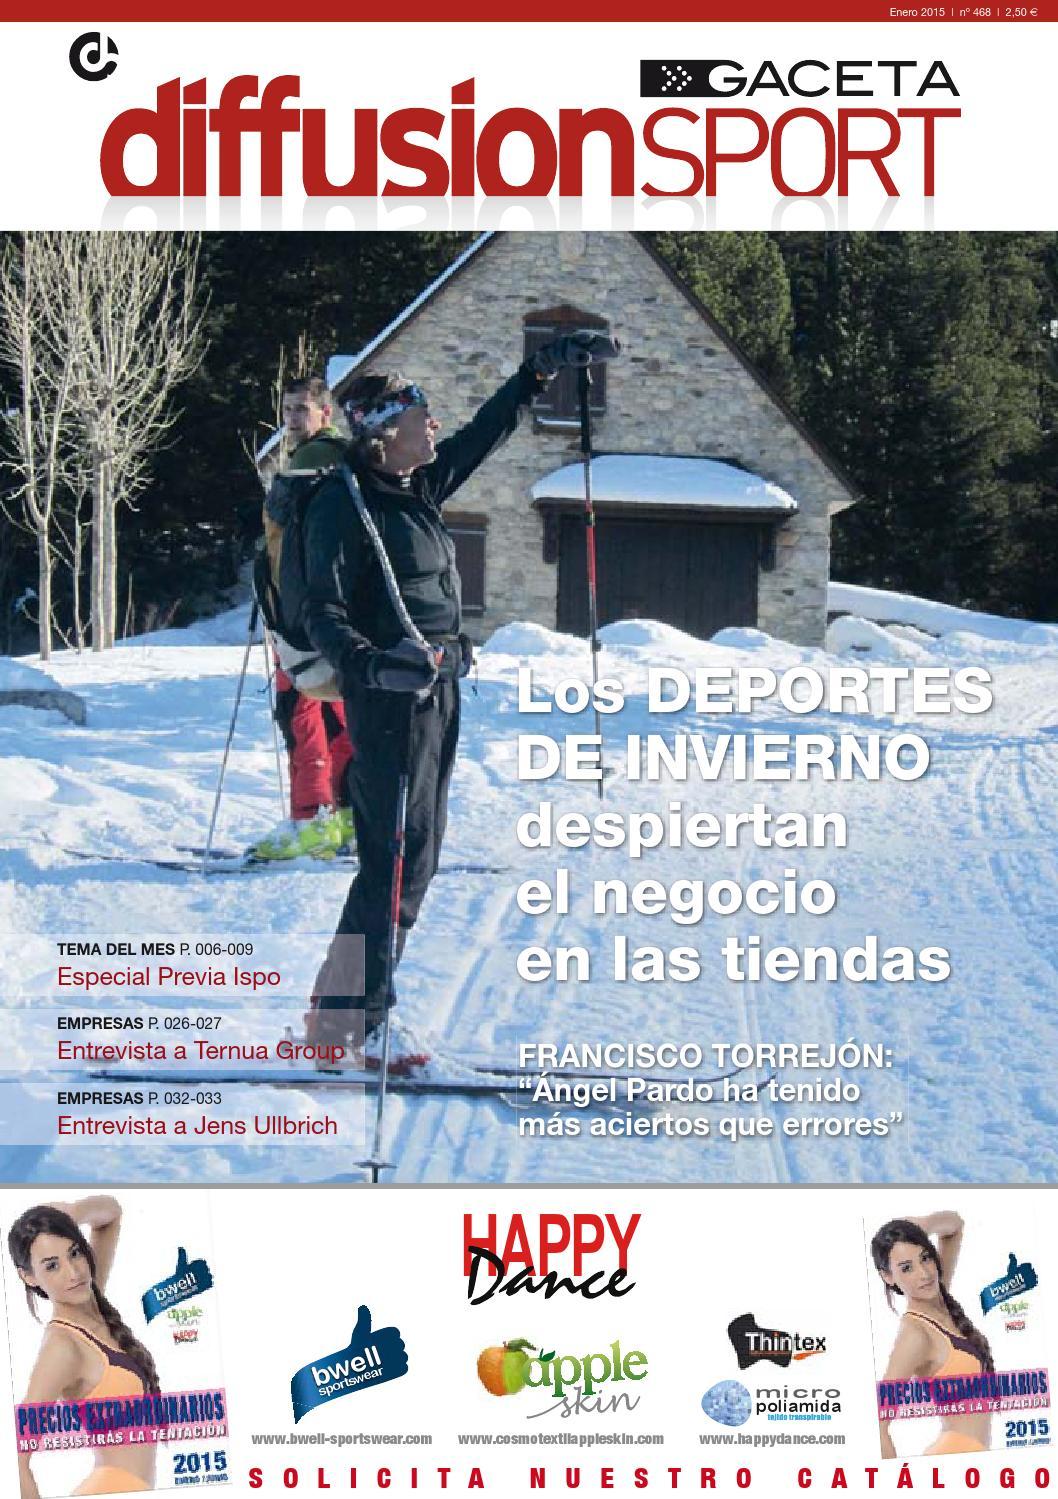 hot sale online b3e35 0444b Diffusion Sport - 468 by Peldaño - issuu